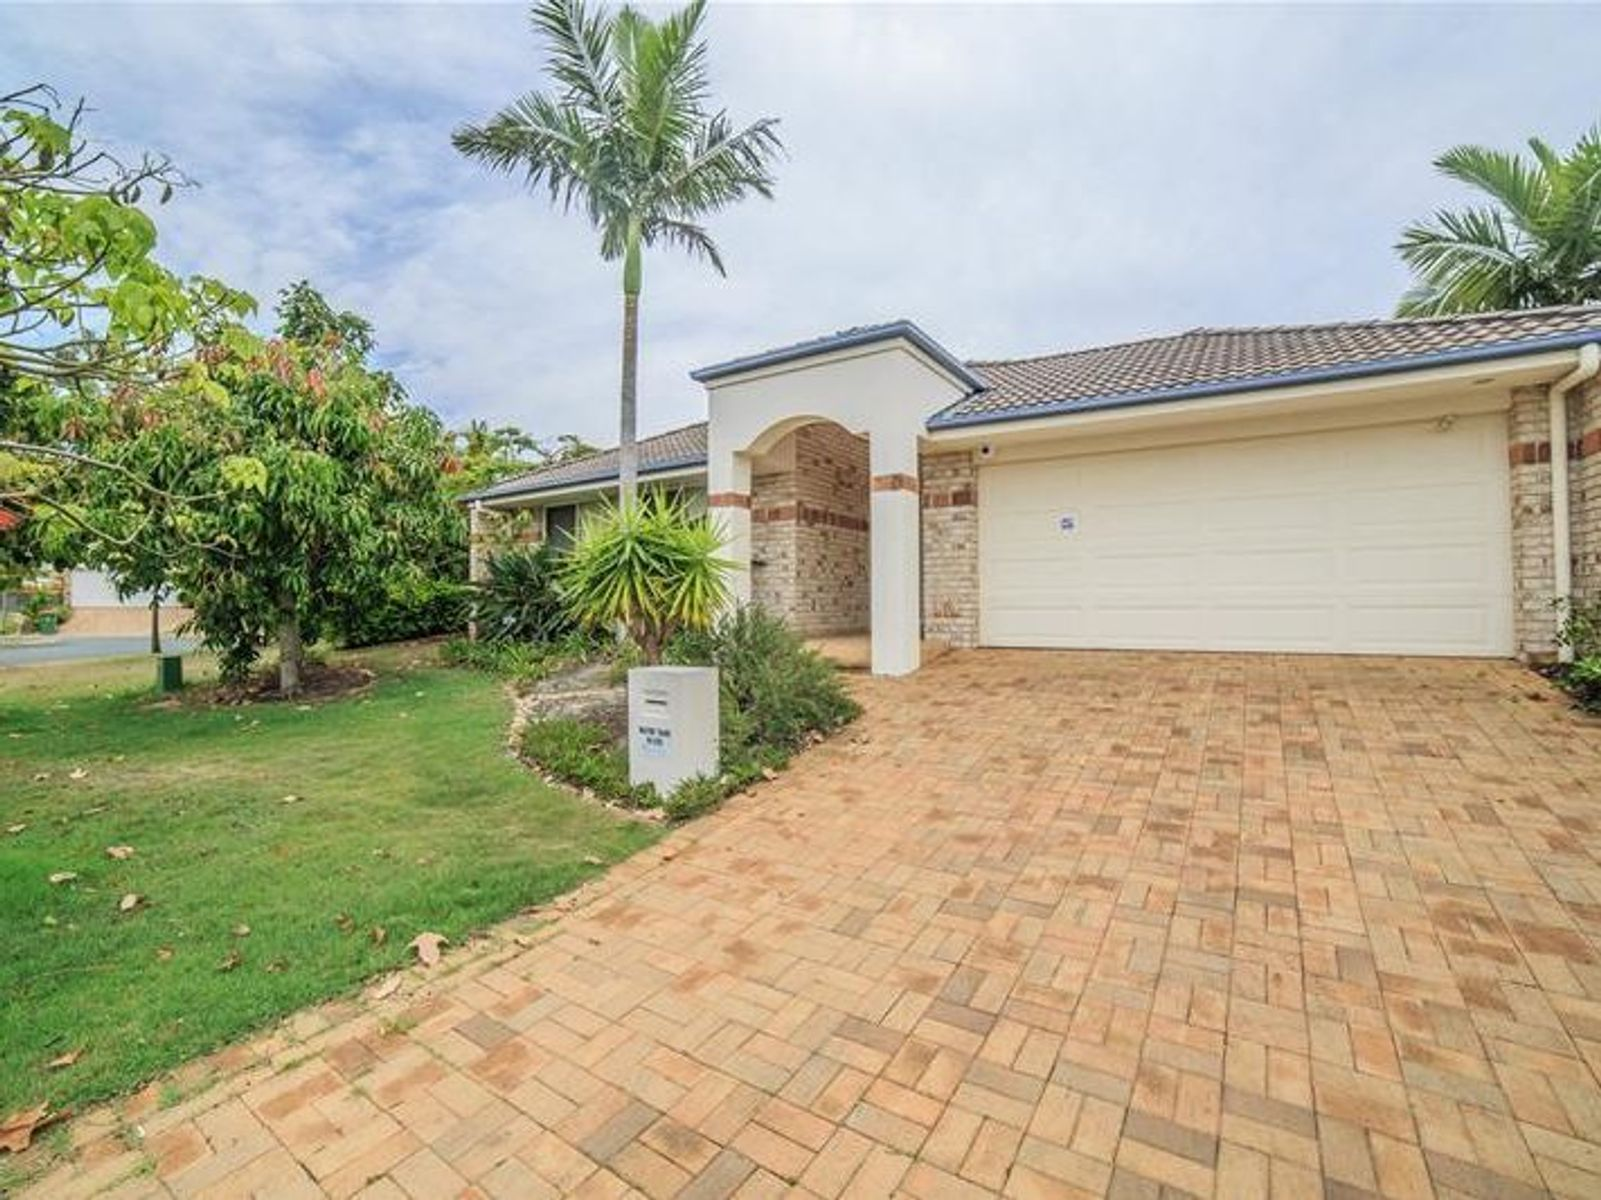 47 Mikado Way, Robina, QLD 4226